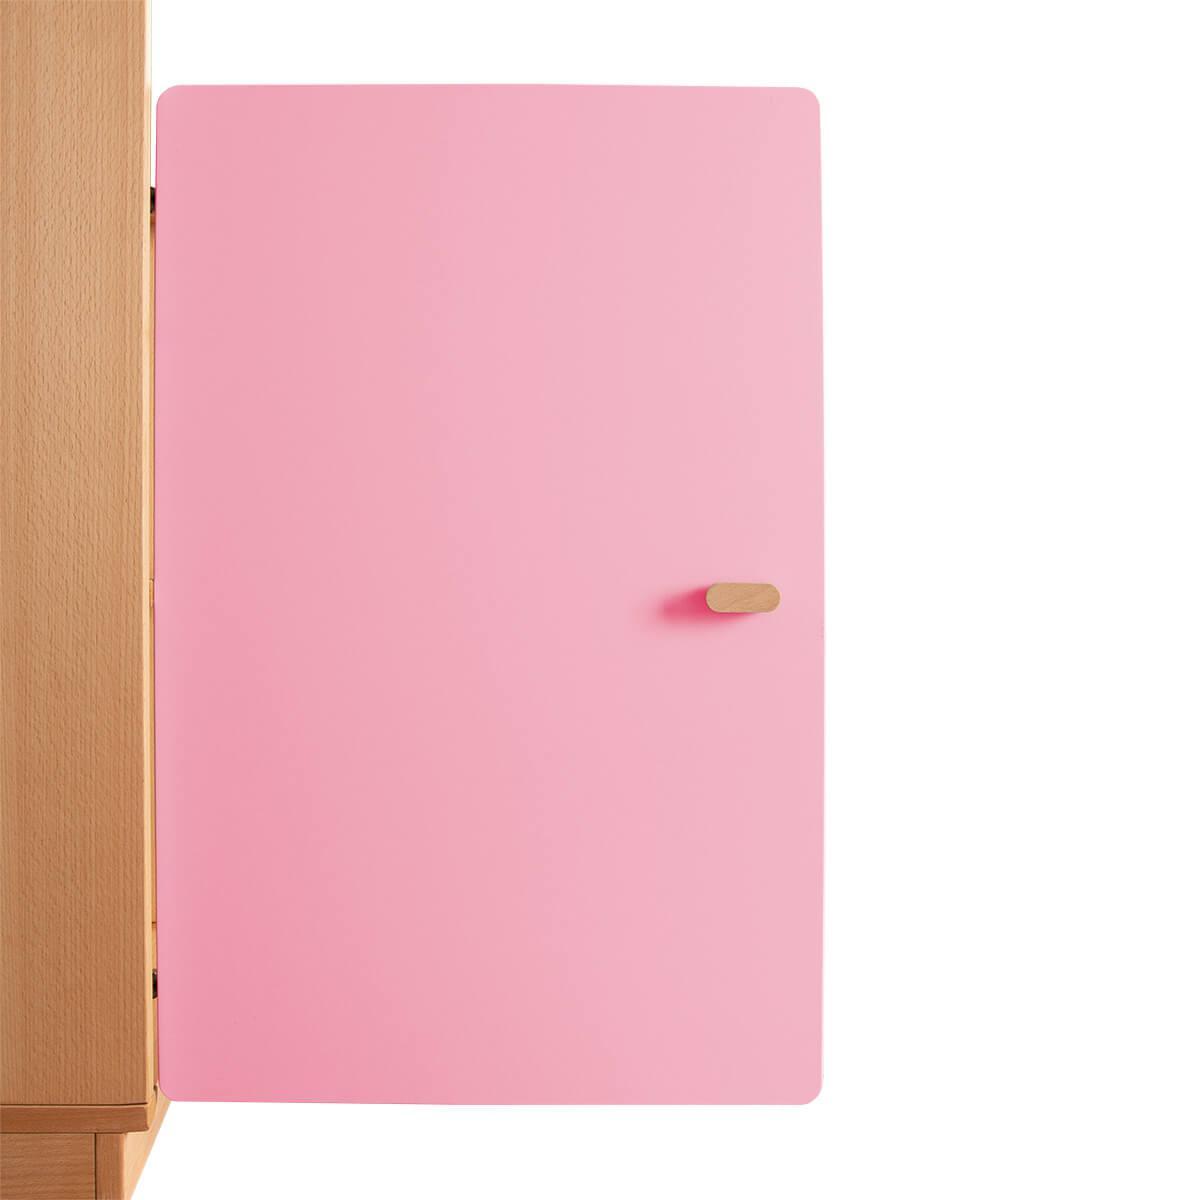 Schranktür 2/5 70cm-Griff DESTYLE de Breuyn MDF rosa-lackiert